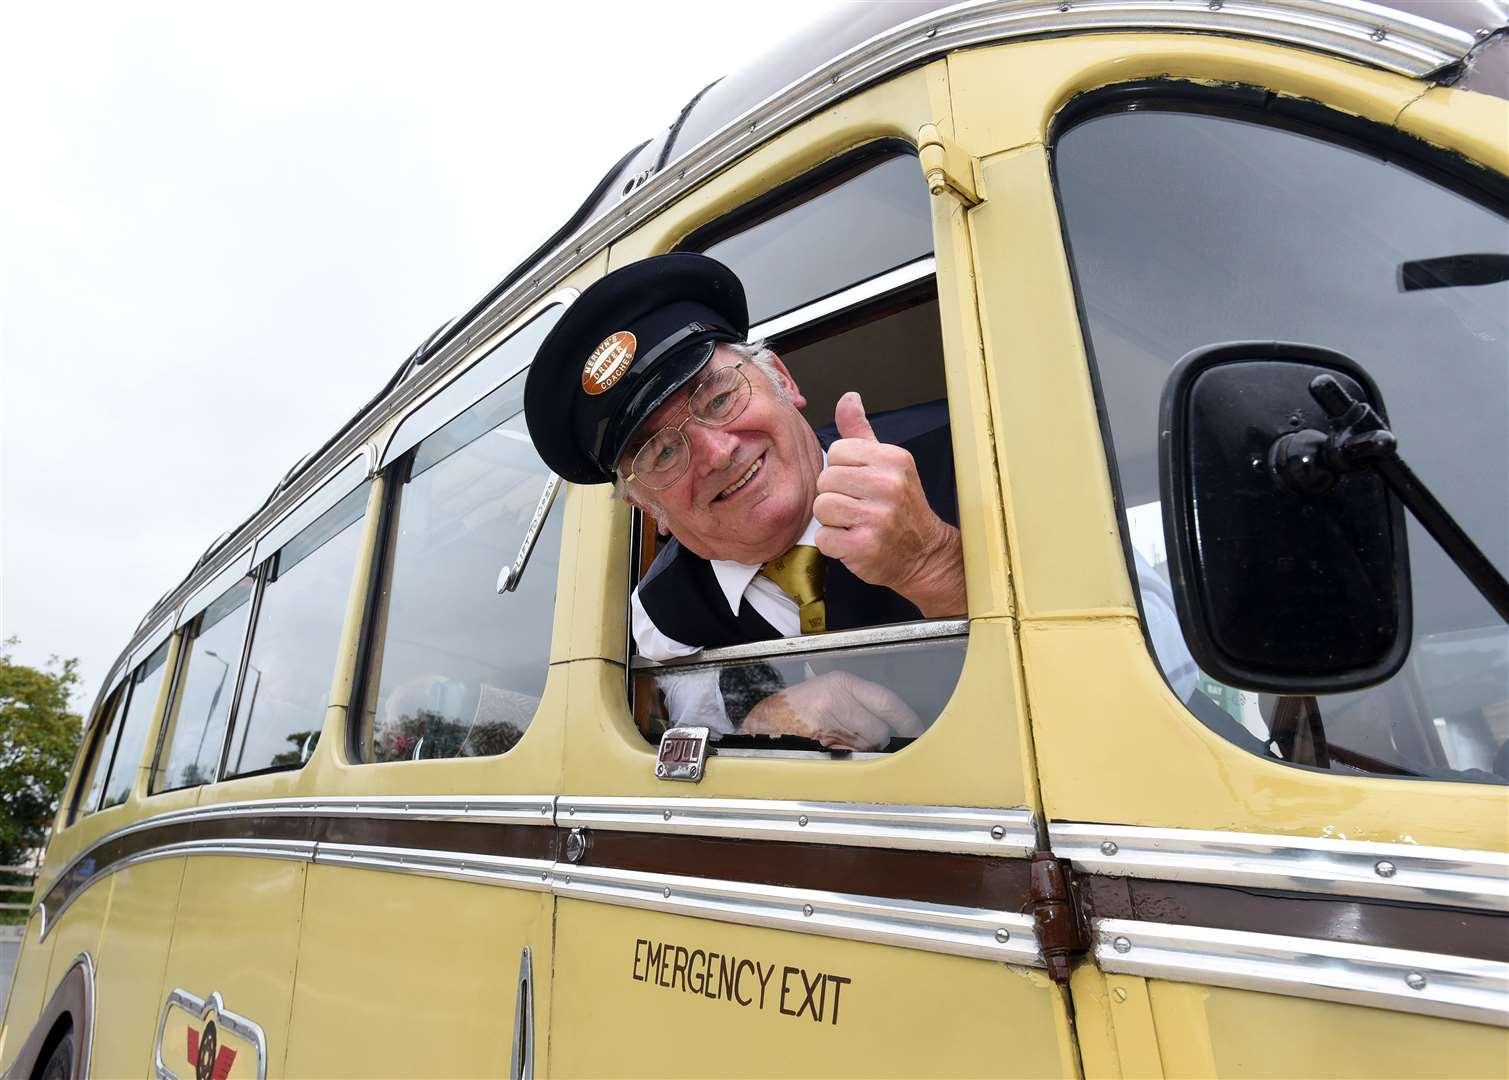 Driver Mervyn Annetts